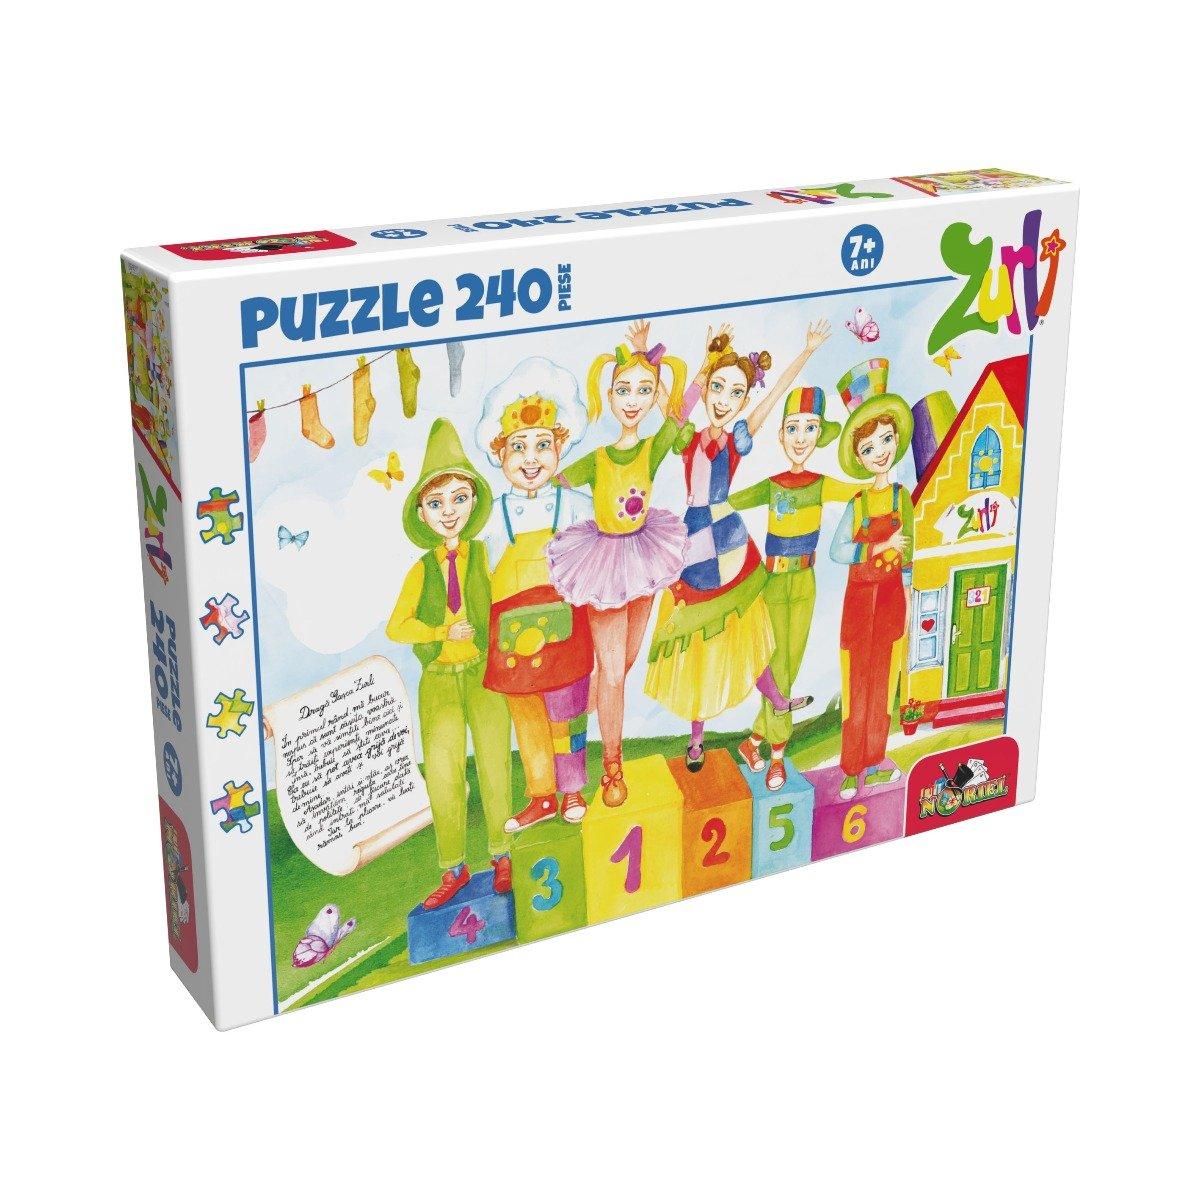 Puzzle clasic Noriel - Gasca Zurli, 240 piese